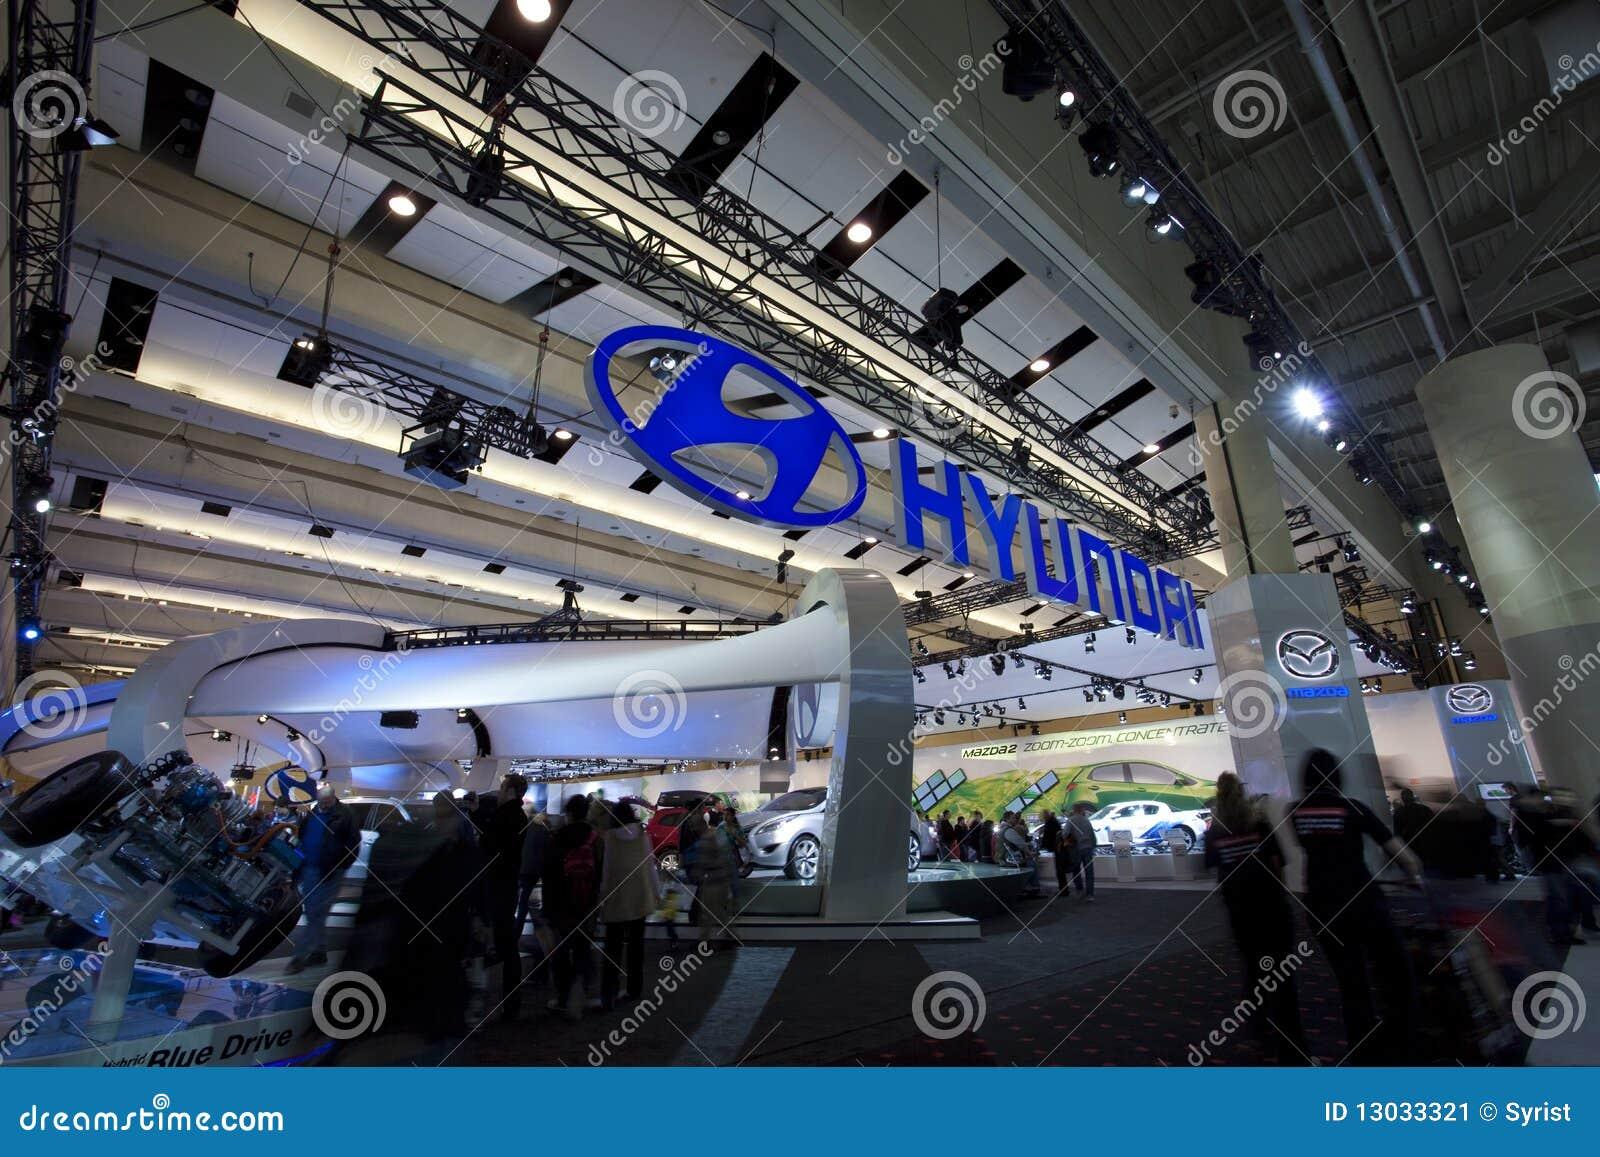 Hyundai exhibit at 2010 Autoshow